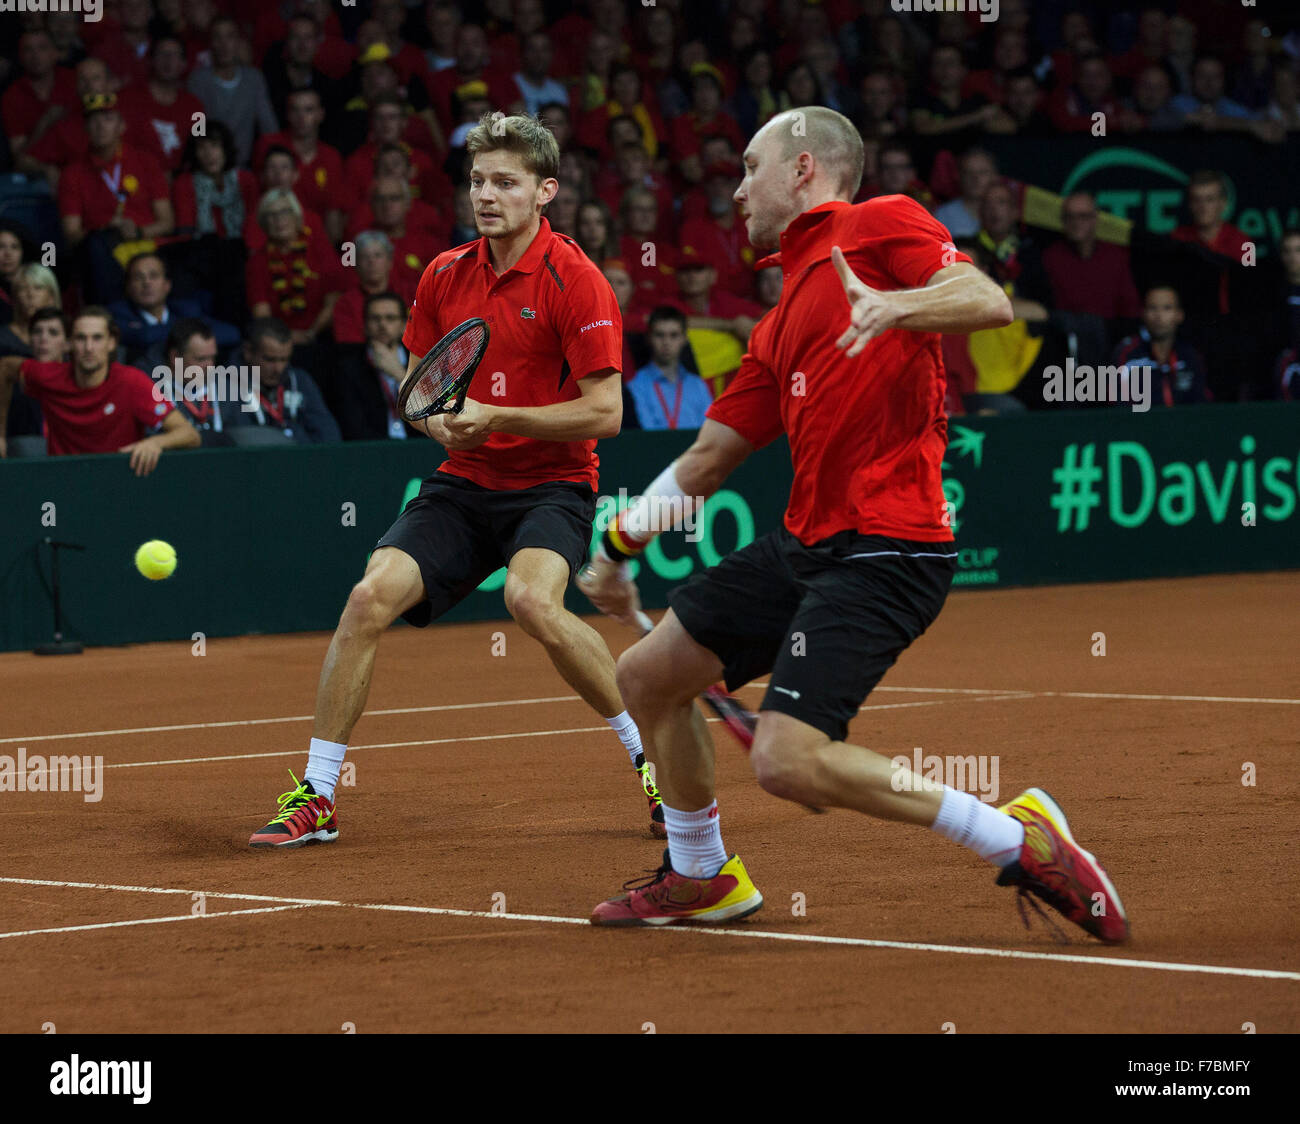 Gent, Belgium, November 28, 2015, Davis Cup Final, Belgium-Great Britain, day two, doubles match, David Goffin (L) - Stock Image